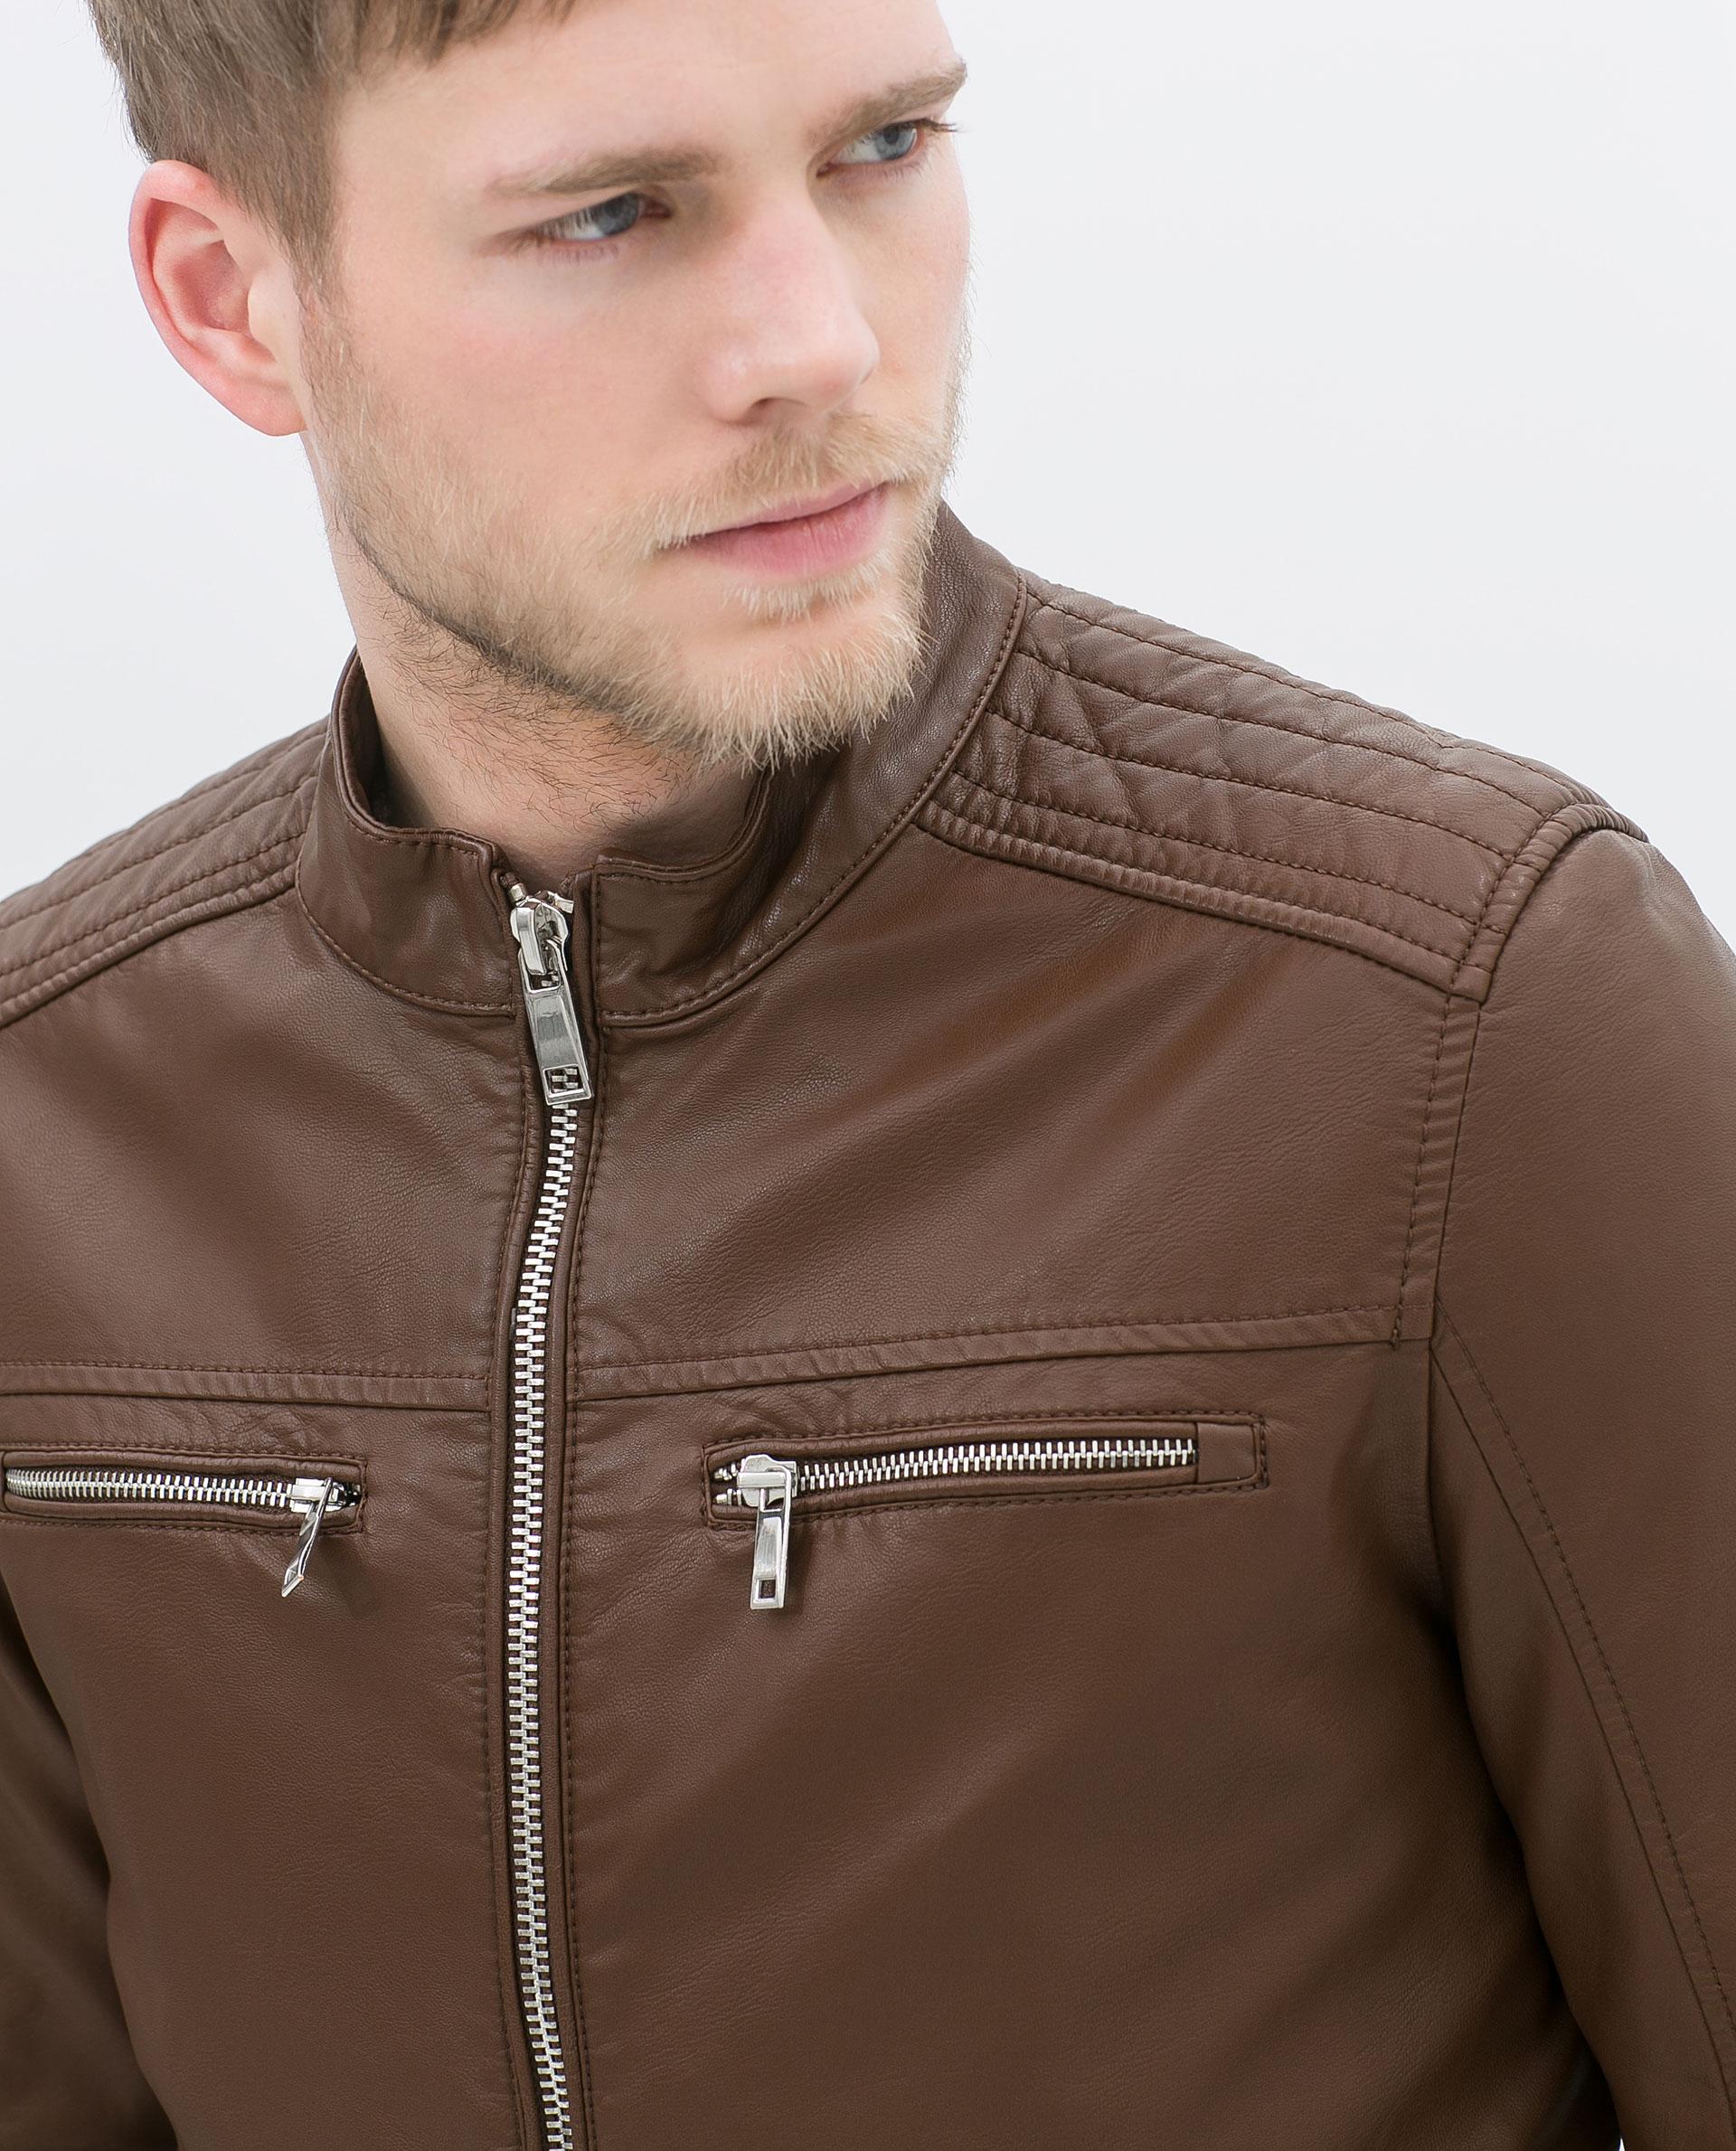 Zara Mens Leather Fur Jacket Cairoamani Com